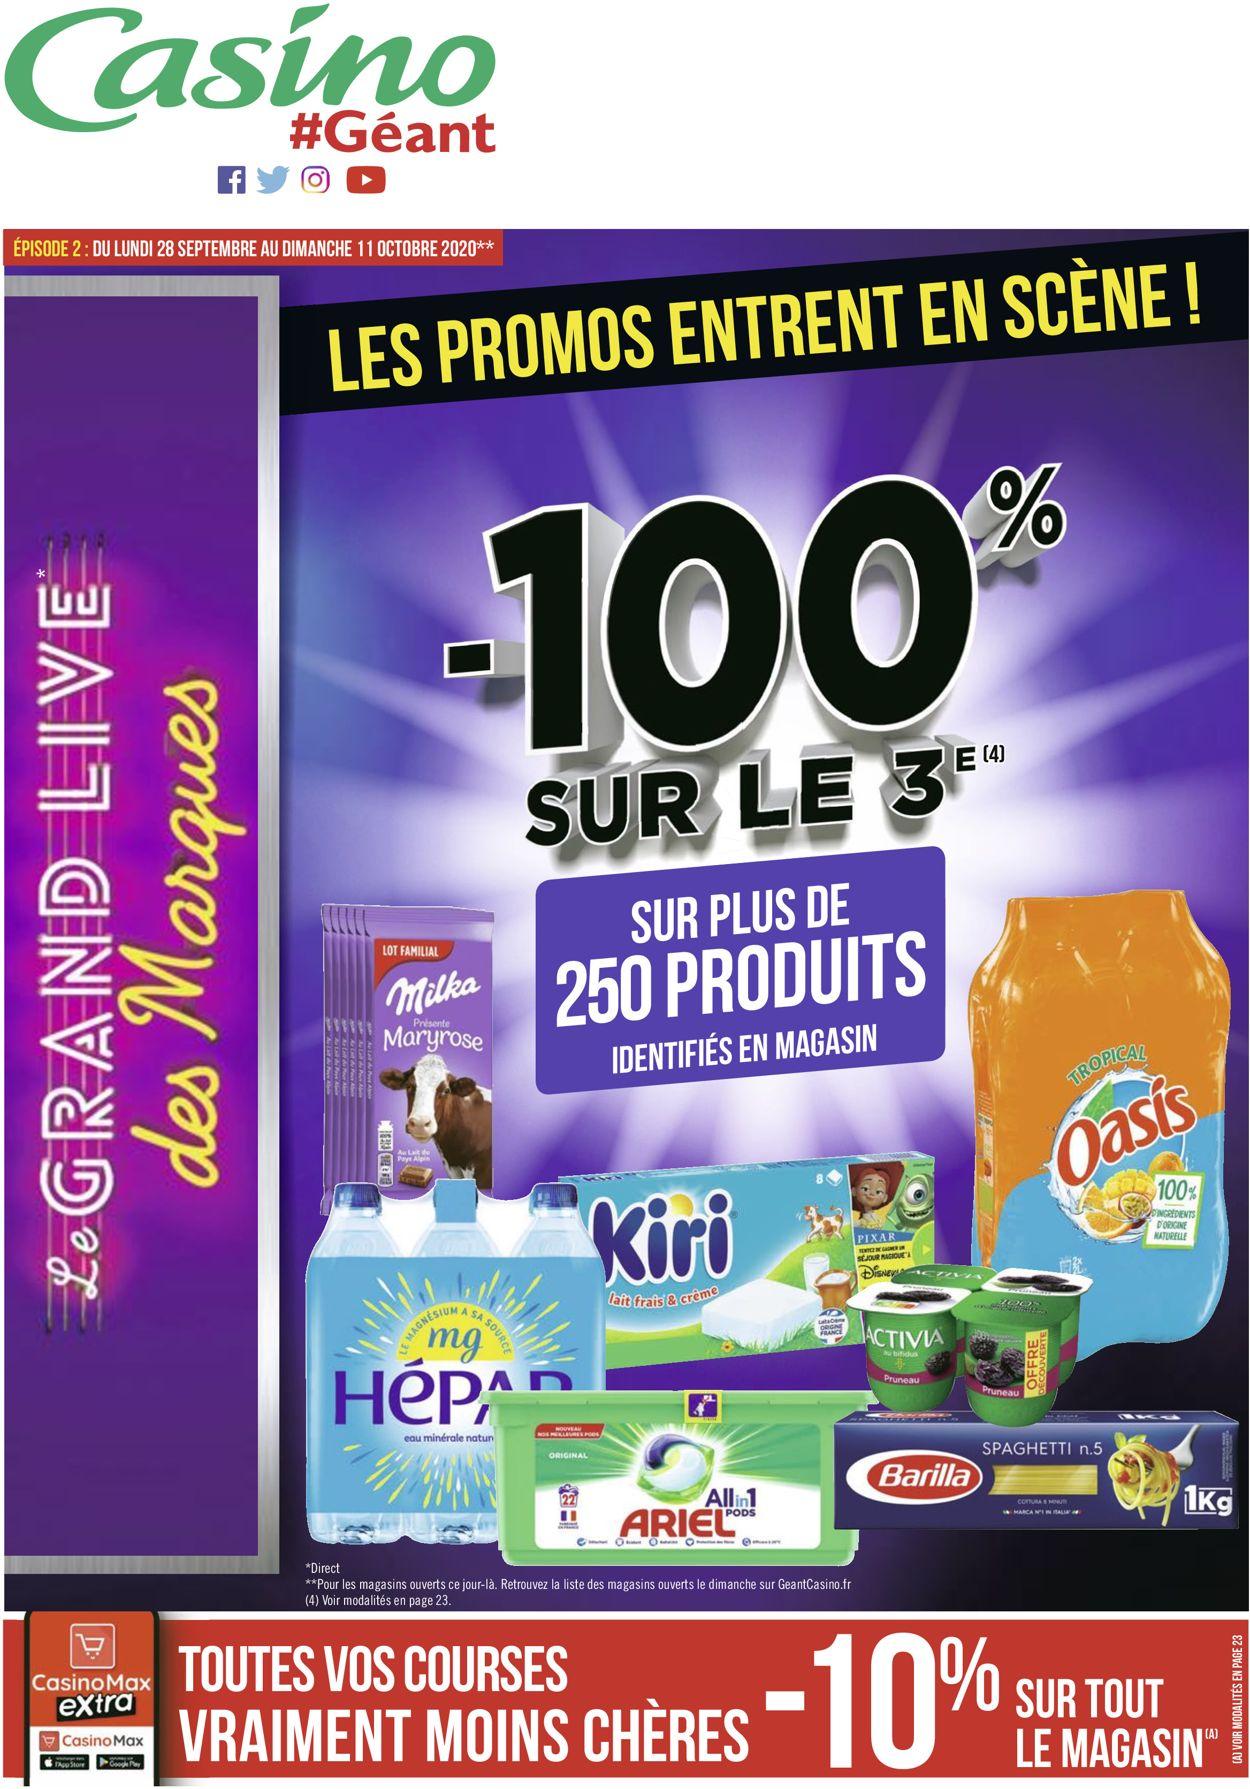 Géant Casino Catalogue - 28.09-11.10.2020